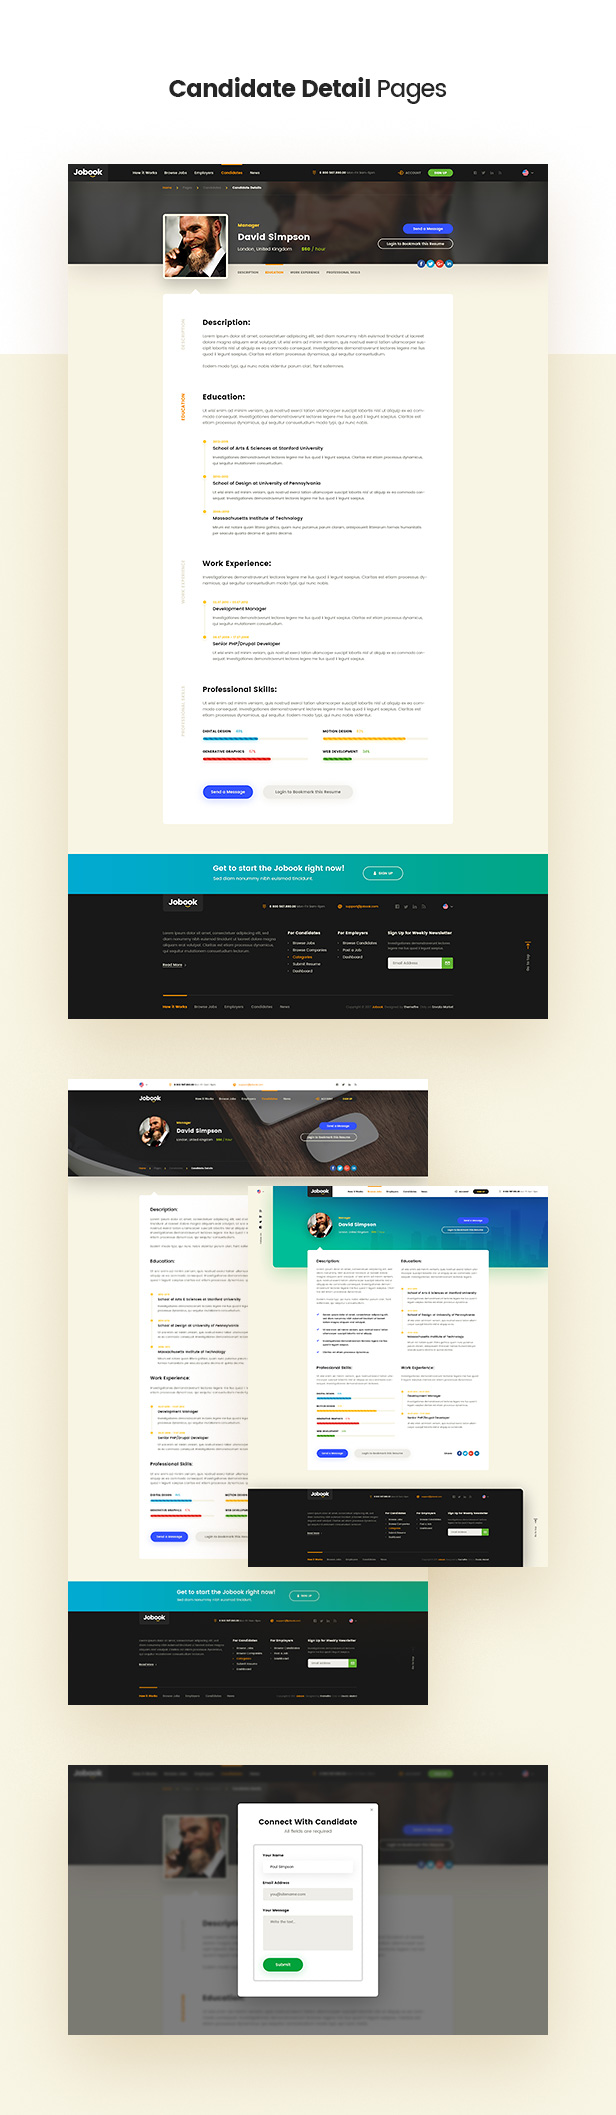 Jobook - A Unique Job Board Website PSD Template - 6